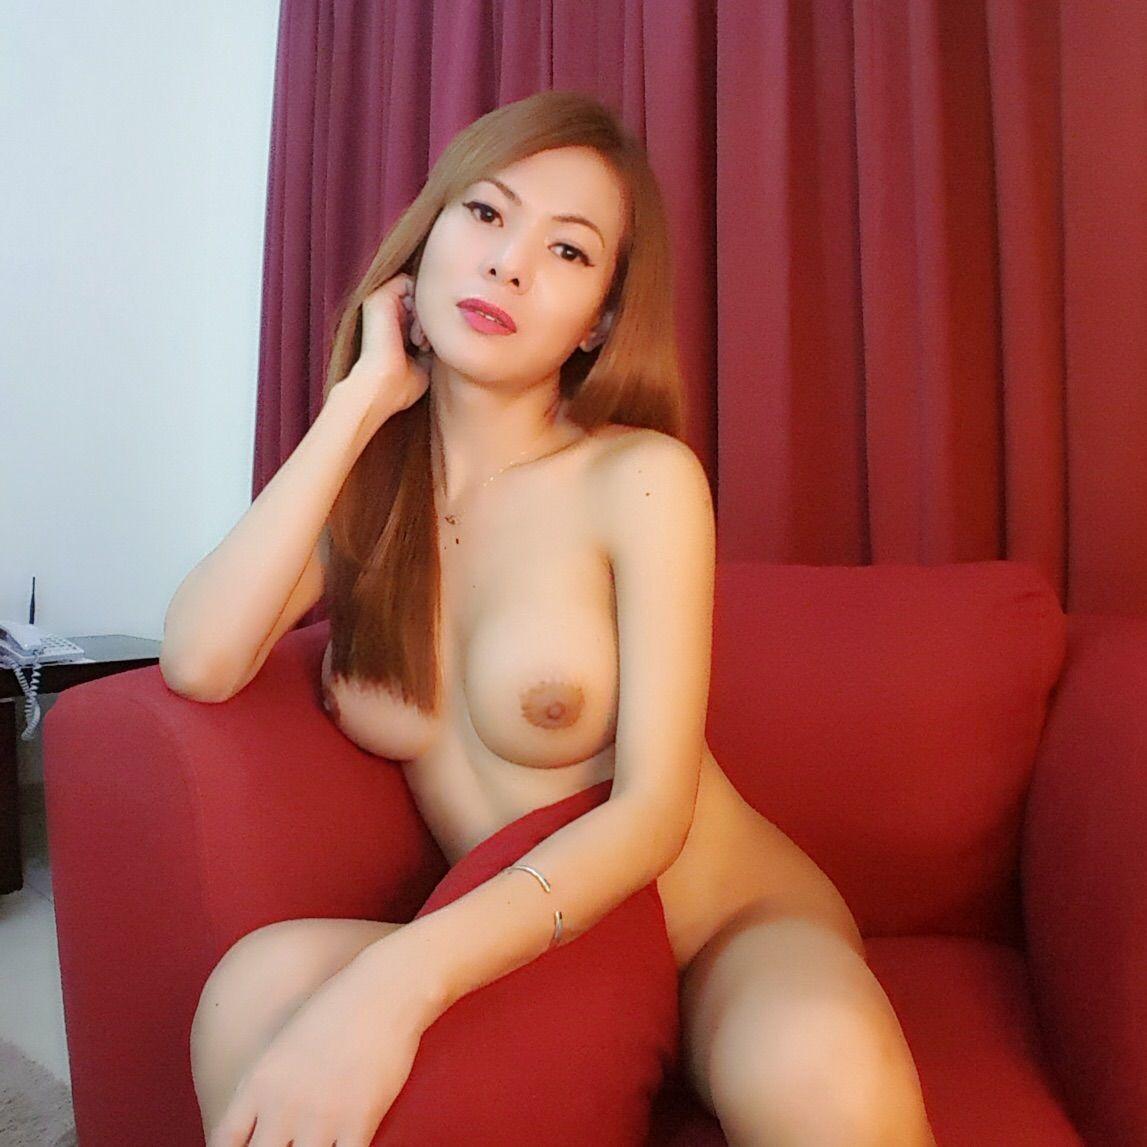 filipina nude in dubai